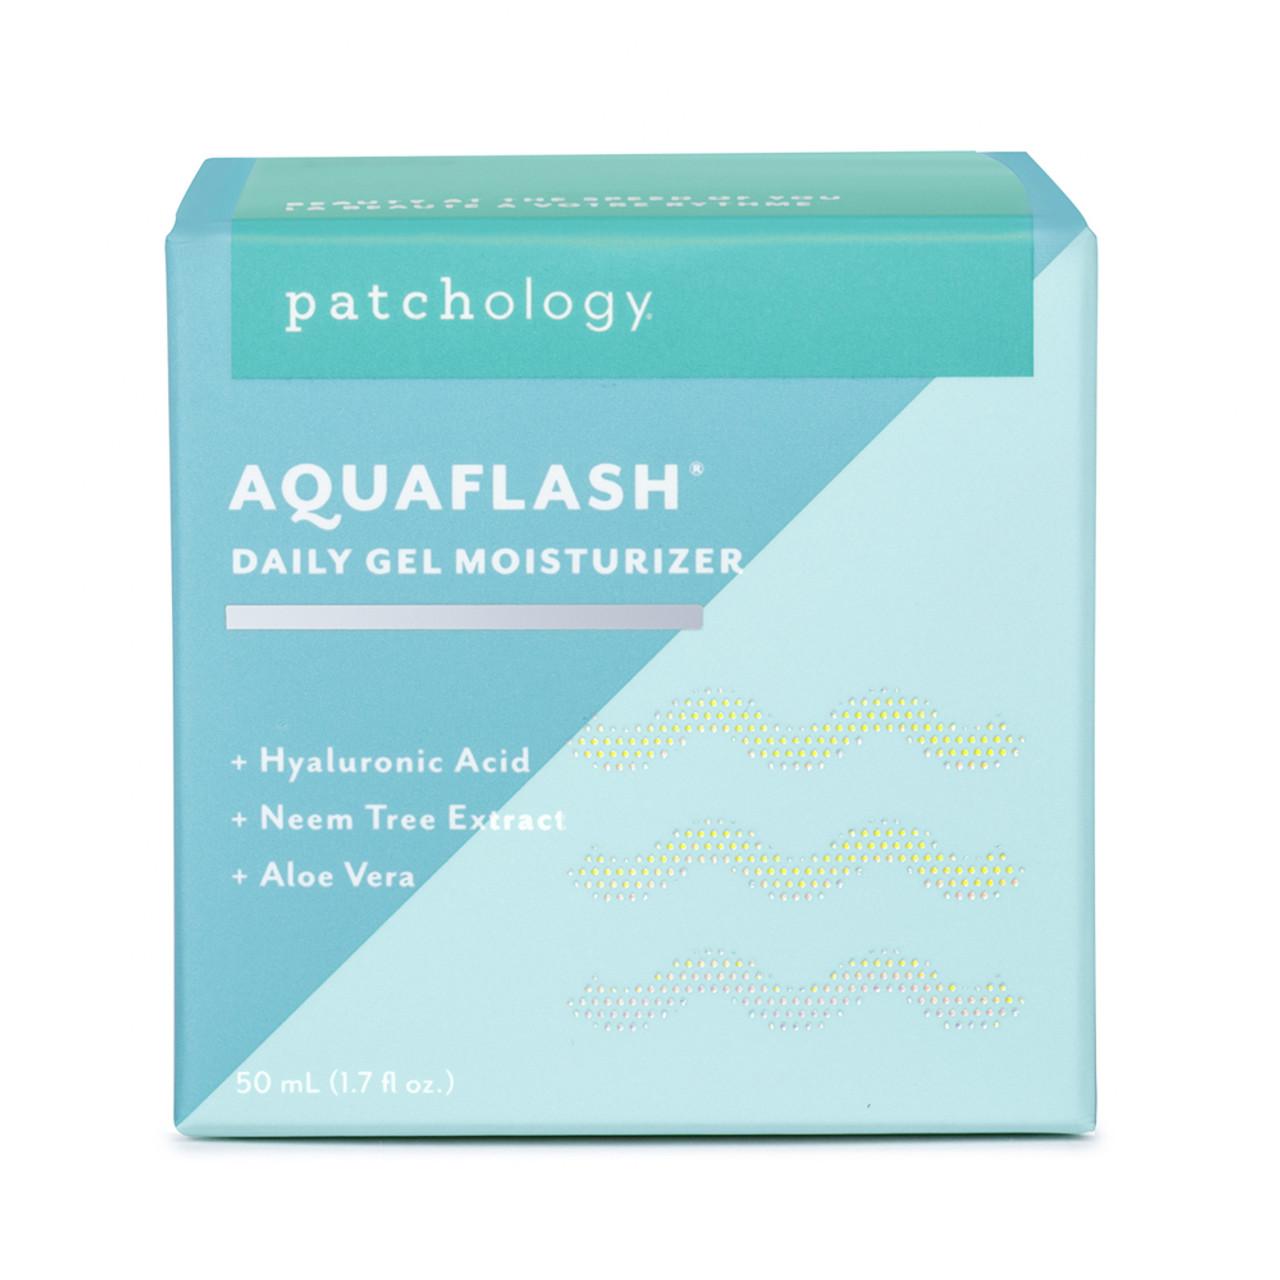 Patchology AquaFlash Daily Gel Moisturizer (discontinued) BeautifiedYou.com